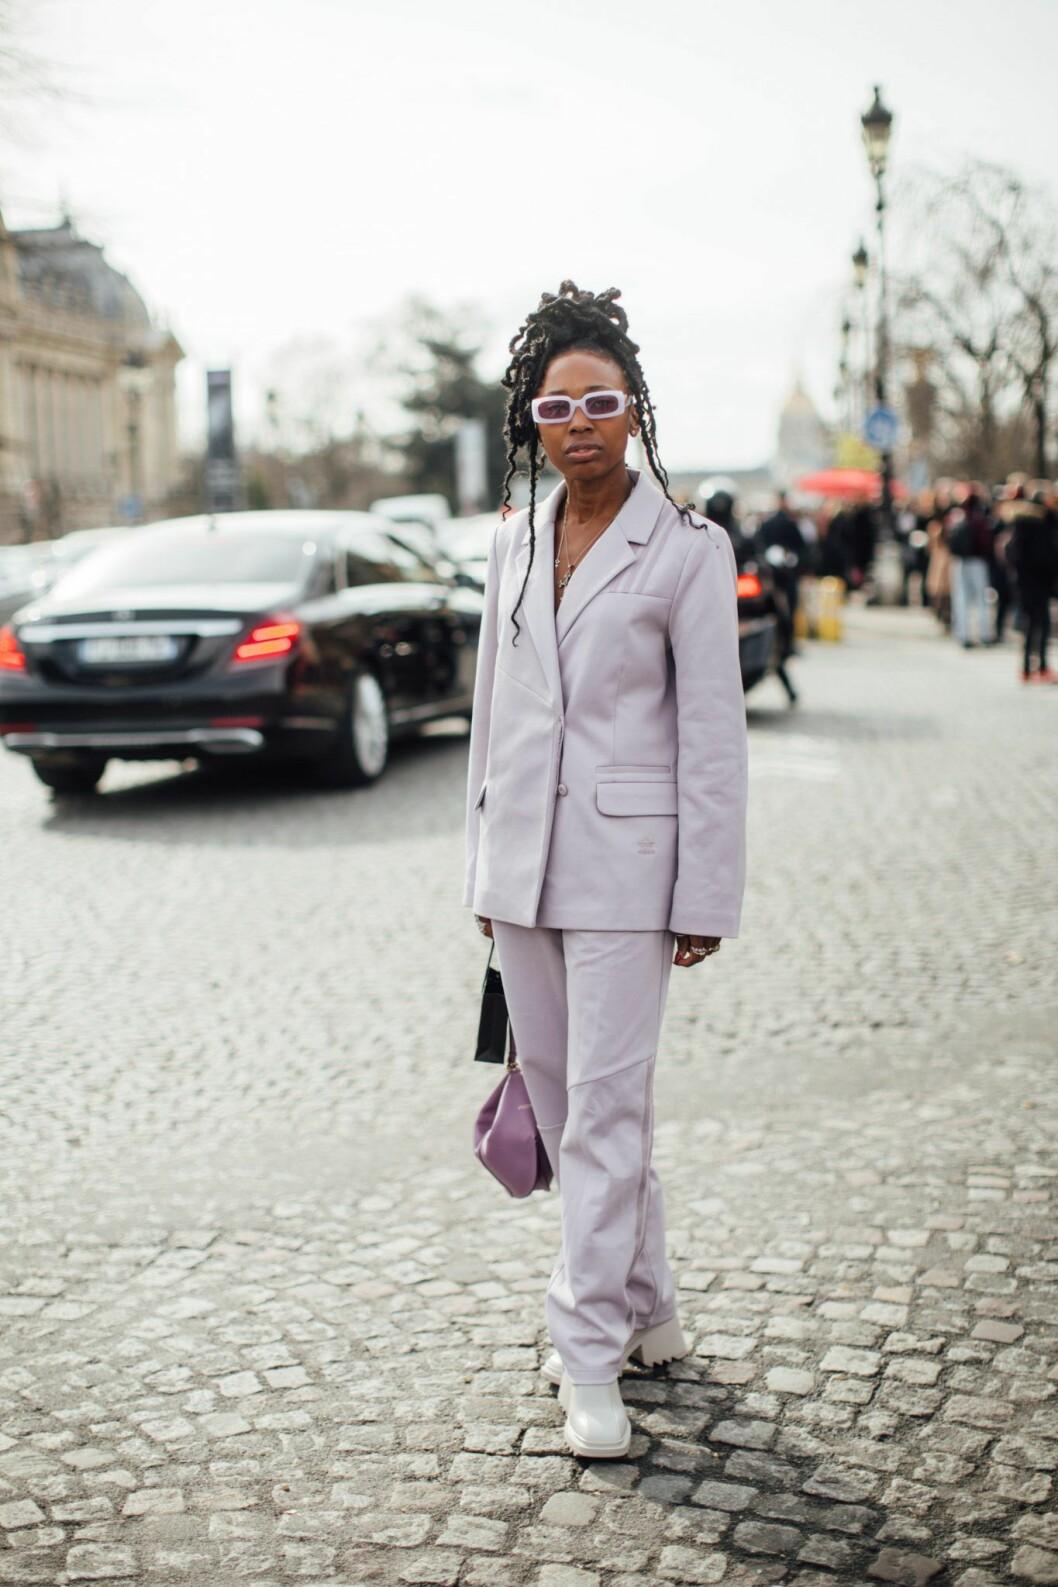 Lavendellila kostym från streetstyle från Paris Fashion week.